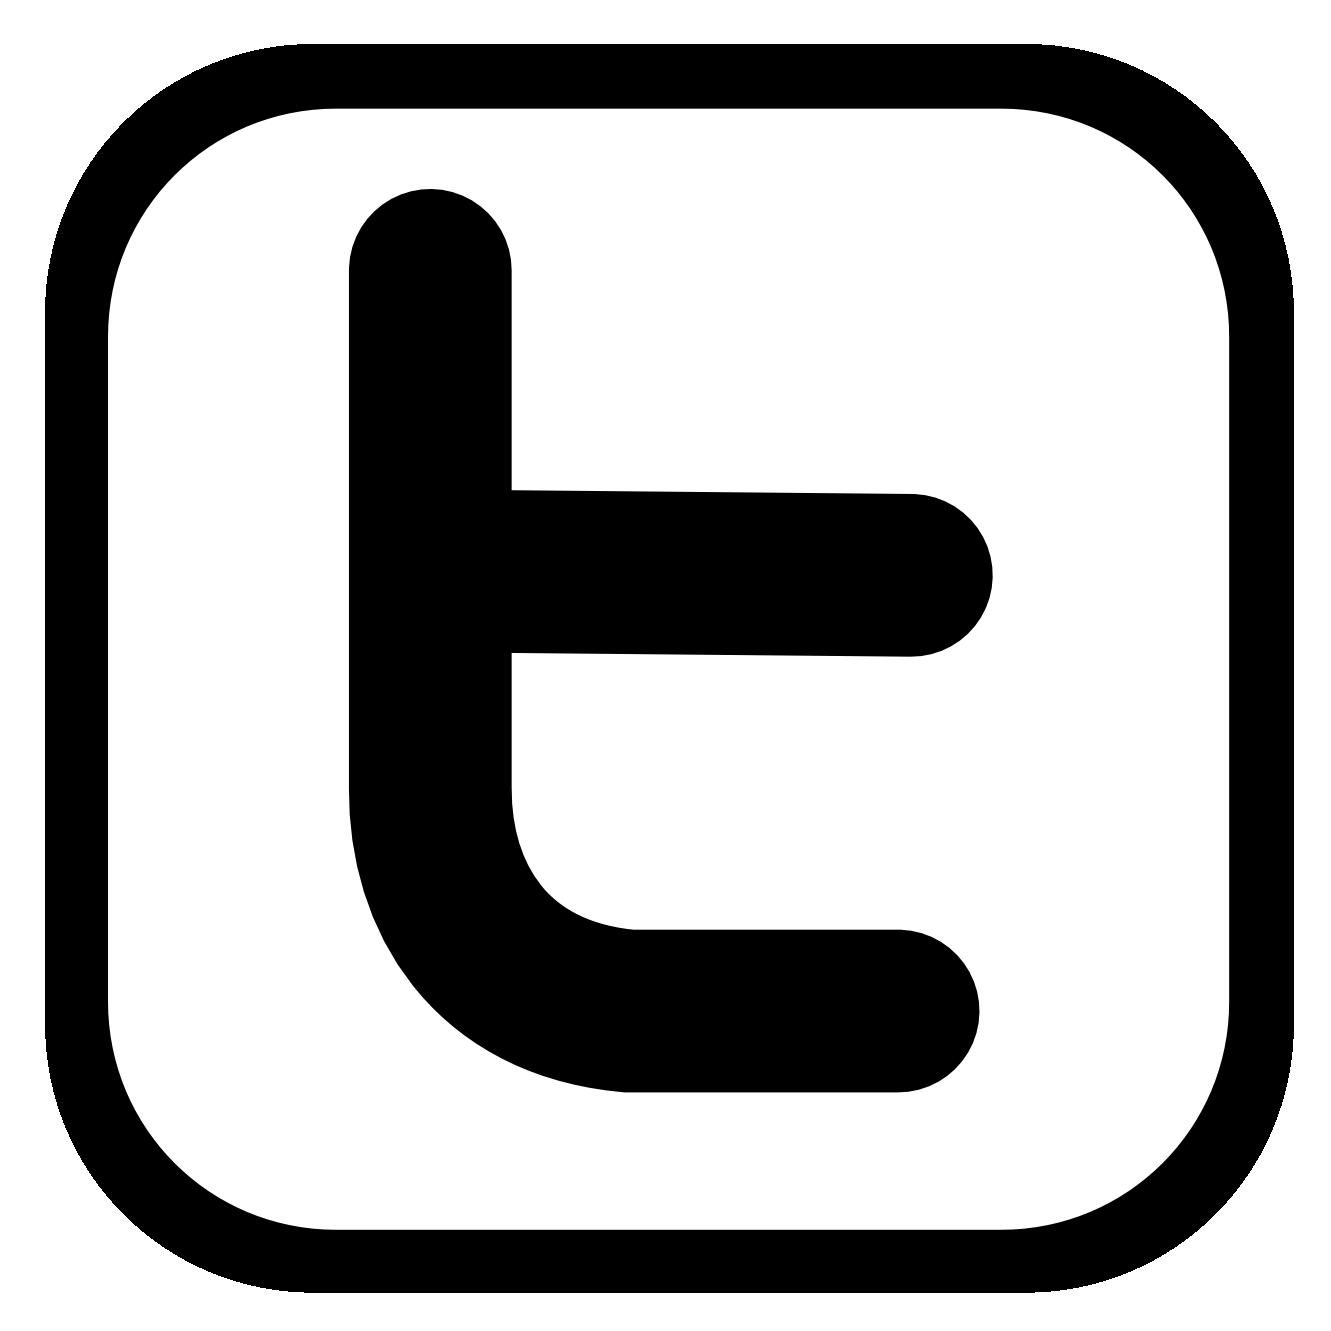 Black twitter clipart banner black and white library White twitter clipart - ClipartFest banner black and white library